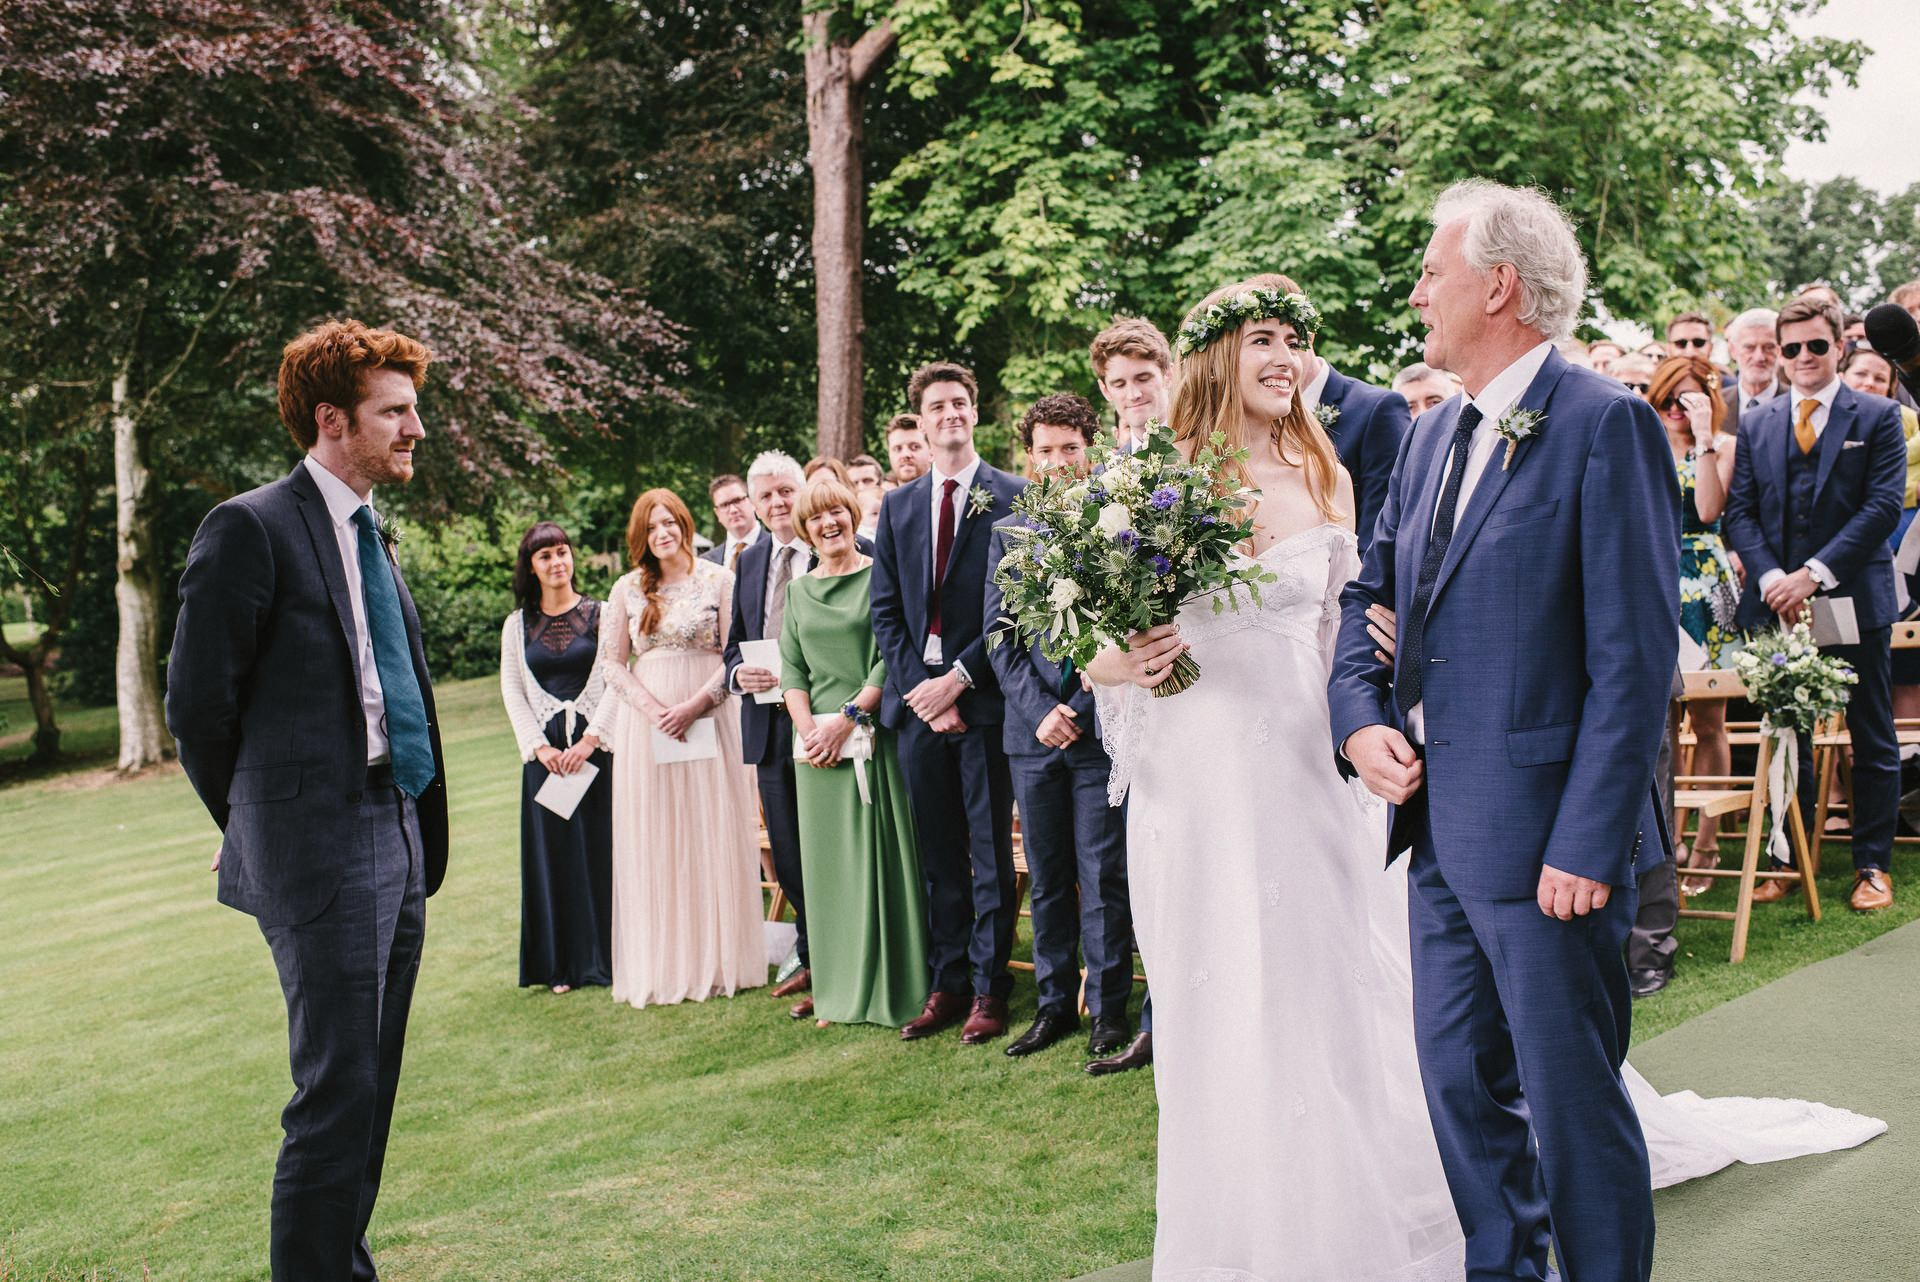 wedding at tullyveery house035.JPG